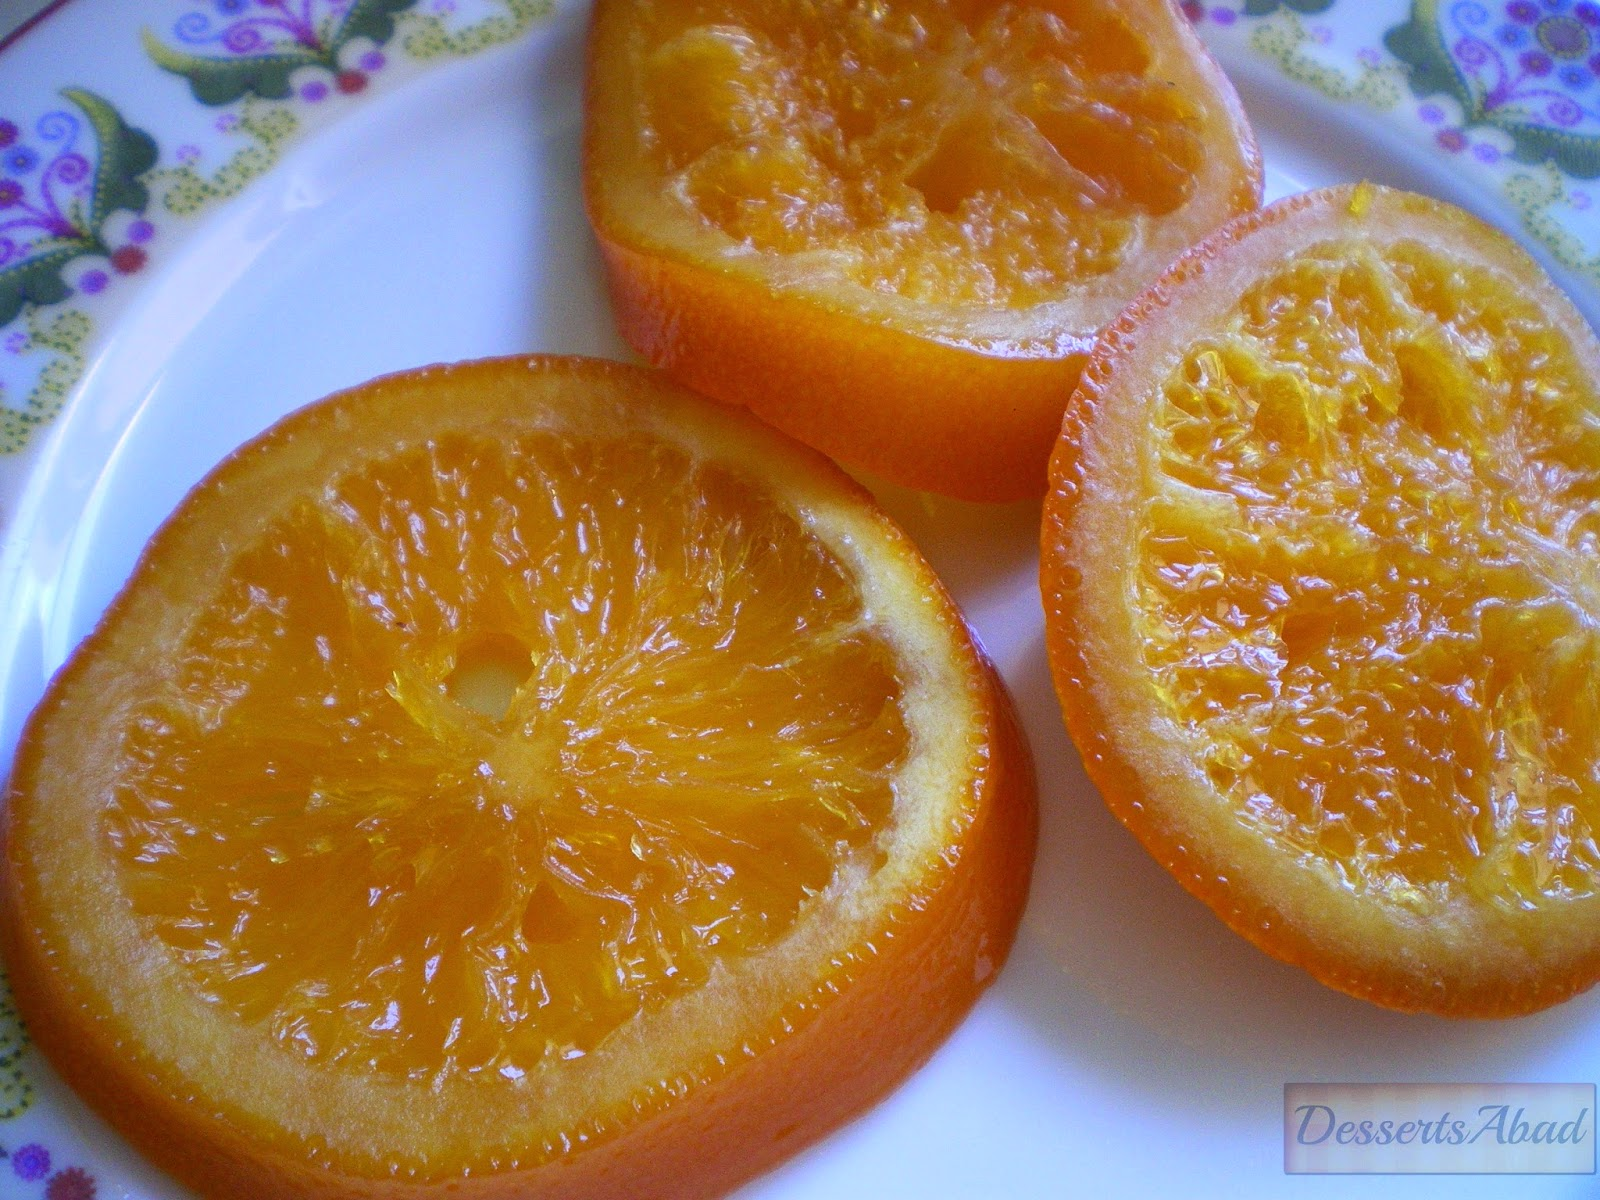 Rodajas de naranja confitada